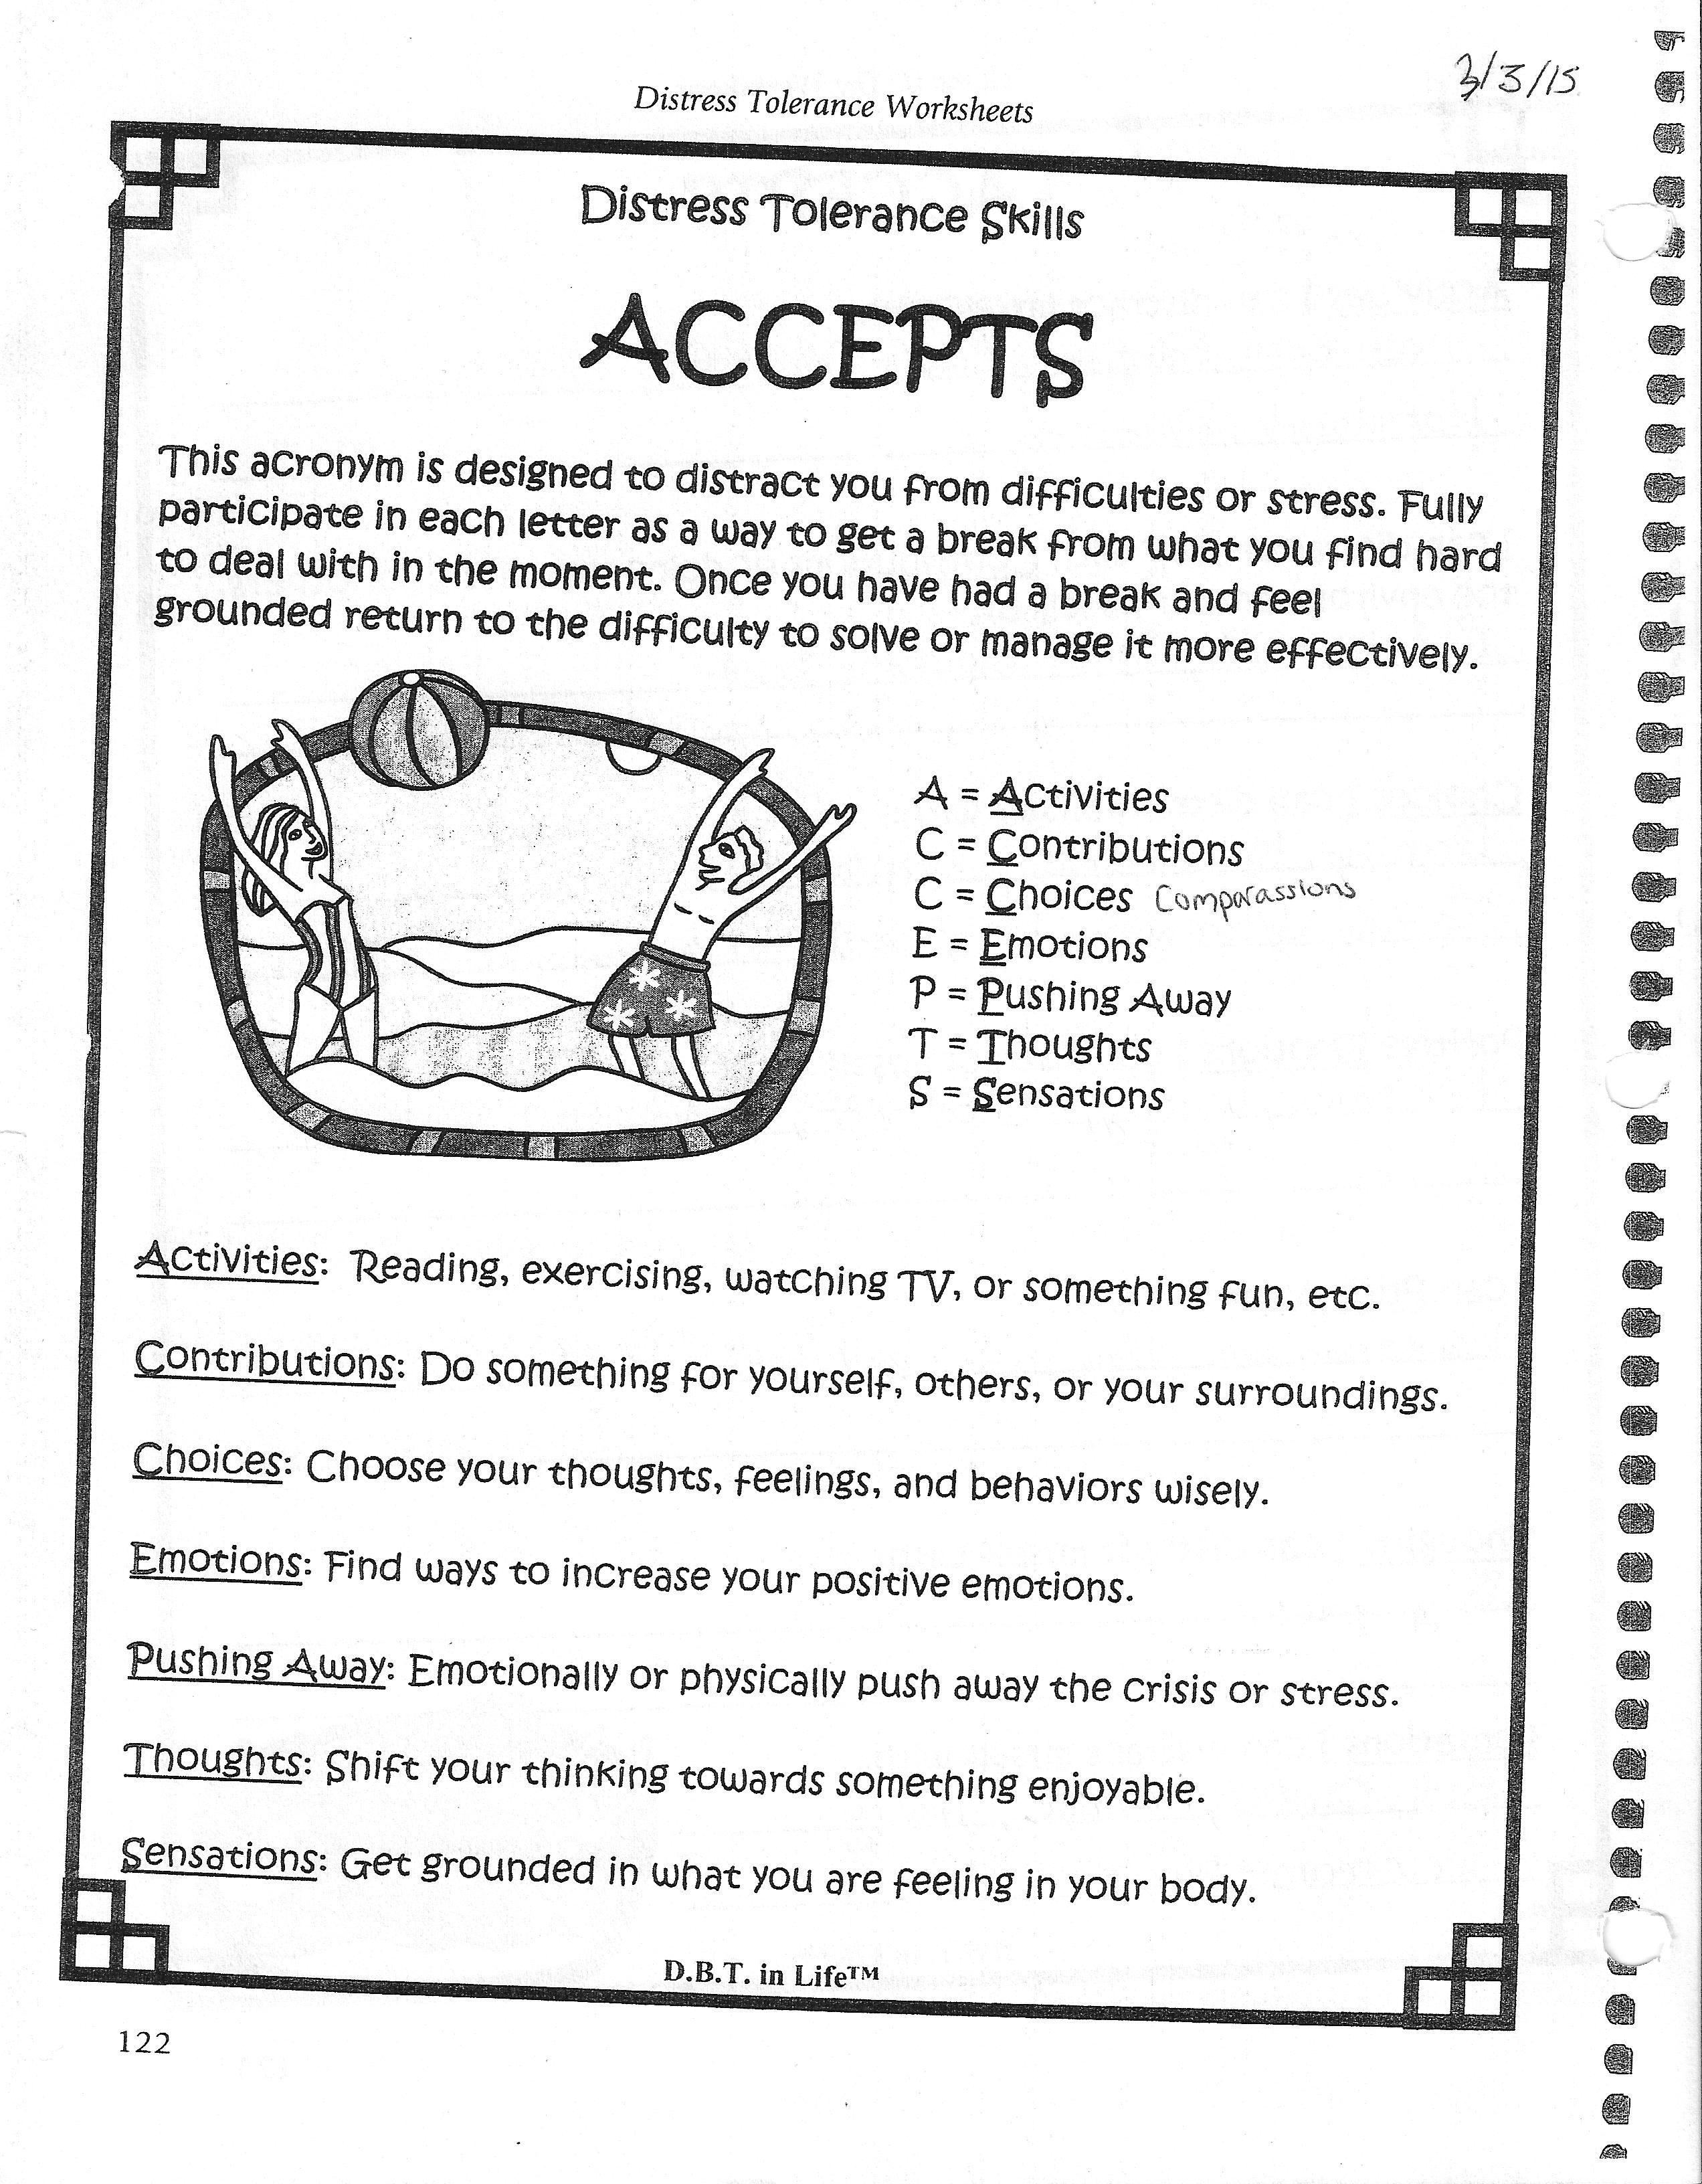 Dbt Distress Tolerance Accepts Worksheet